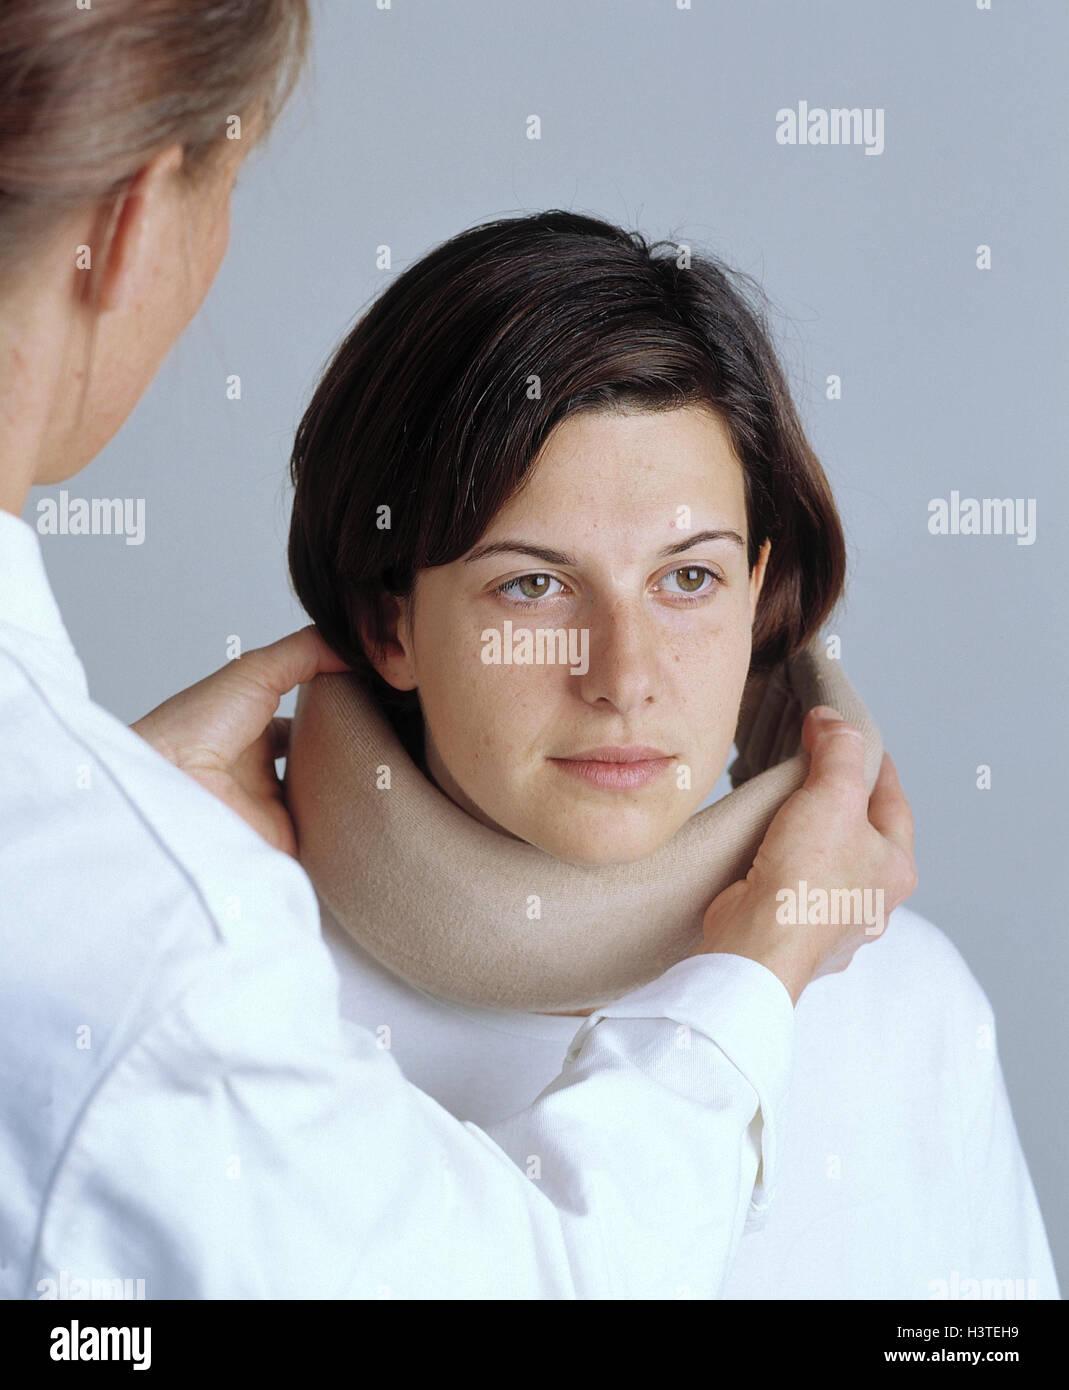 Doctor, patient, complaints, injury, nape, ruff, invest centrifugal trauma, cervical vertebra pillar, cervical vertebra, - Stock Image